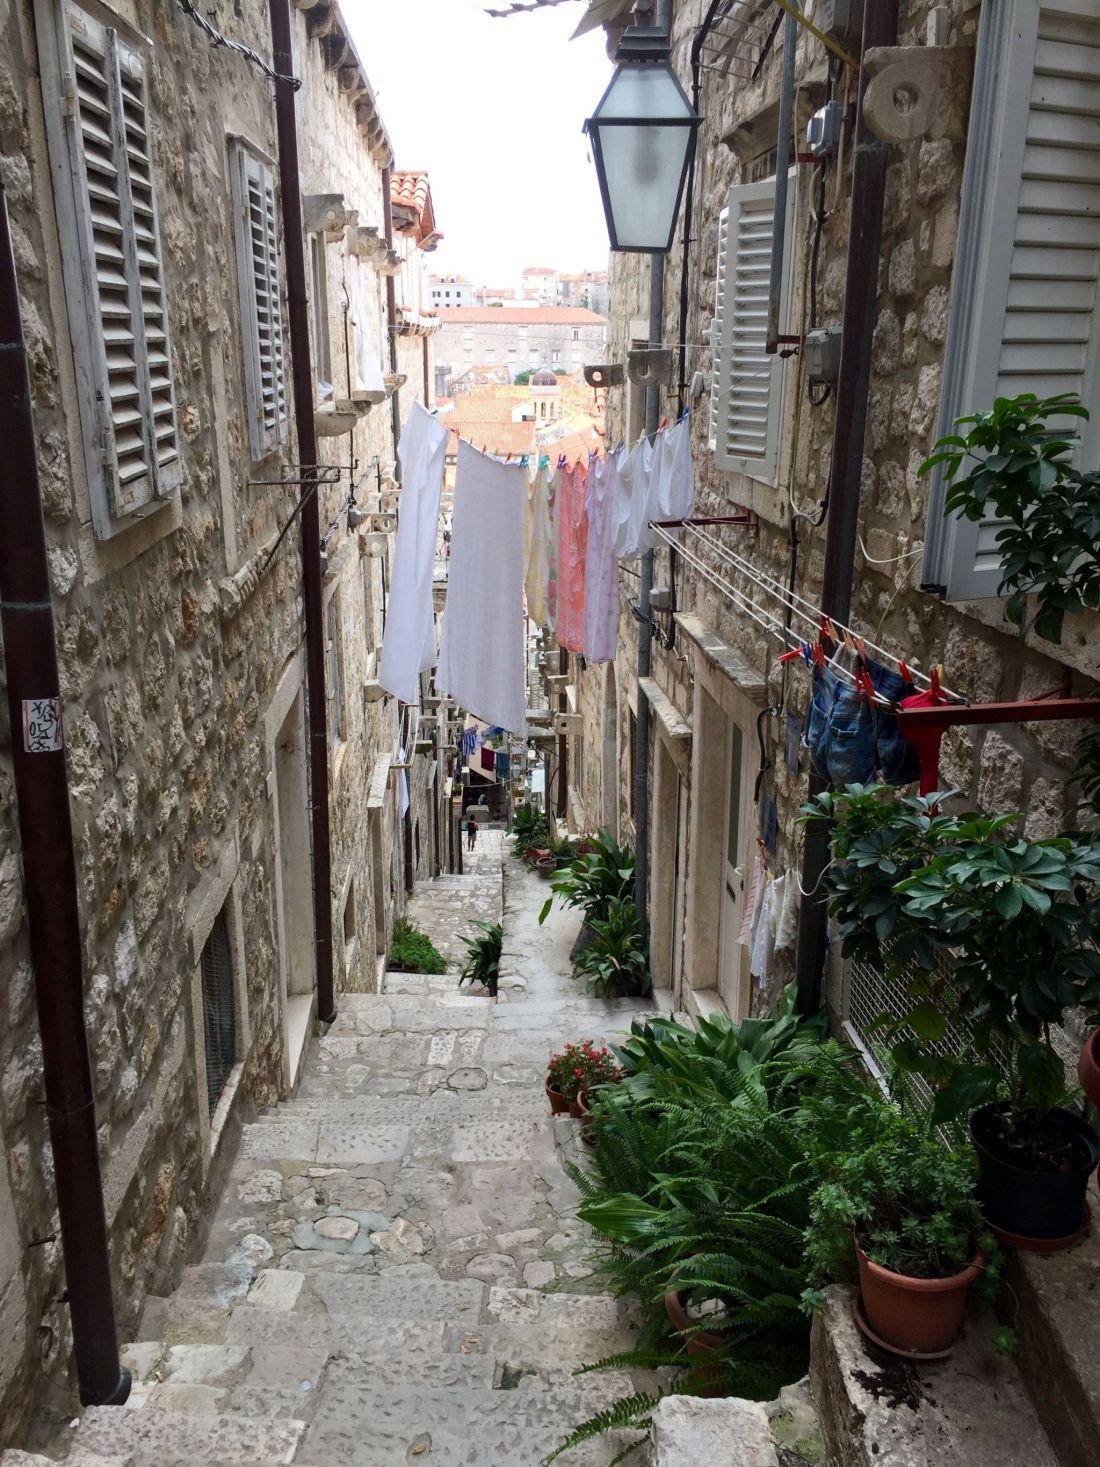 Old Croatia street